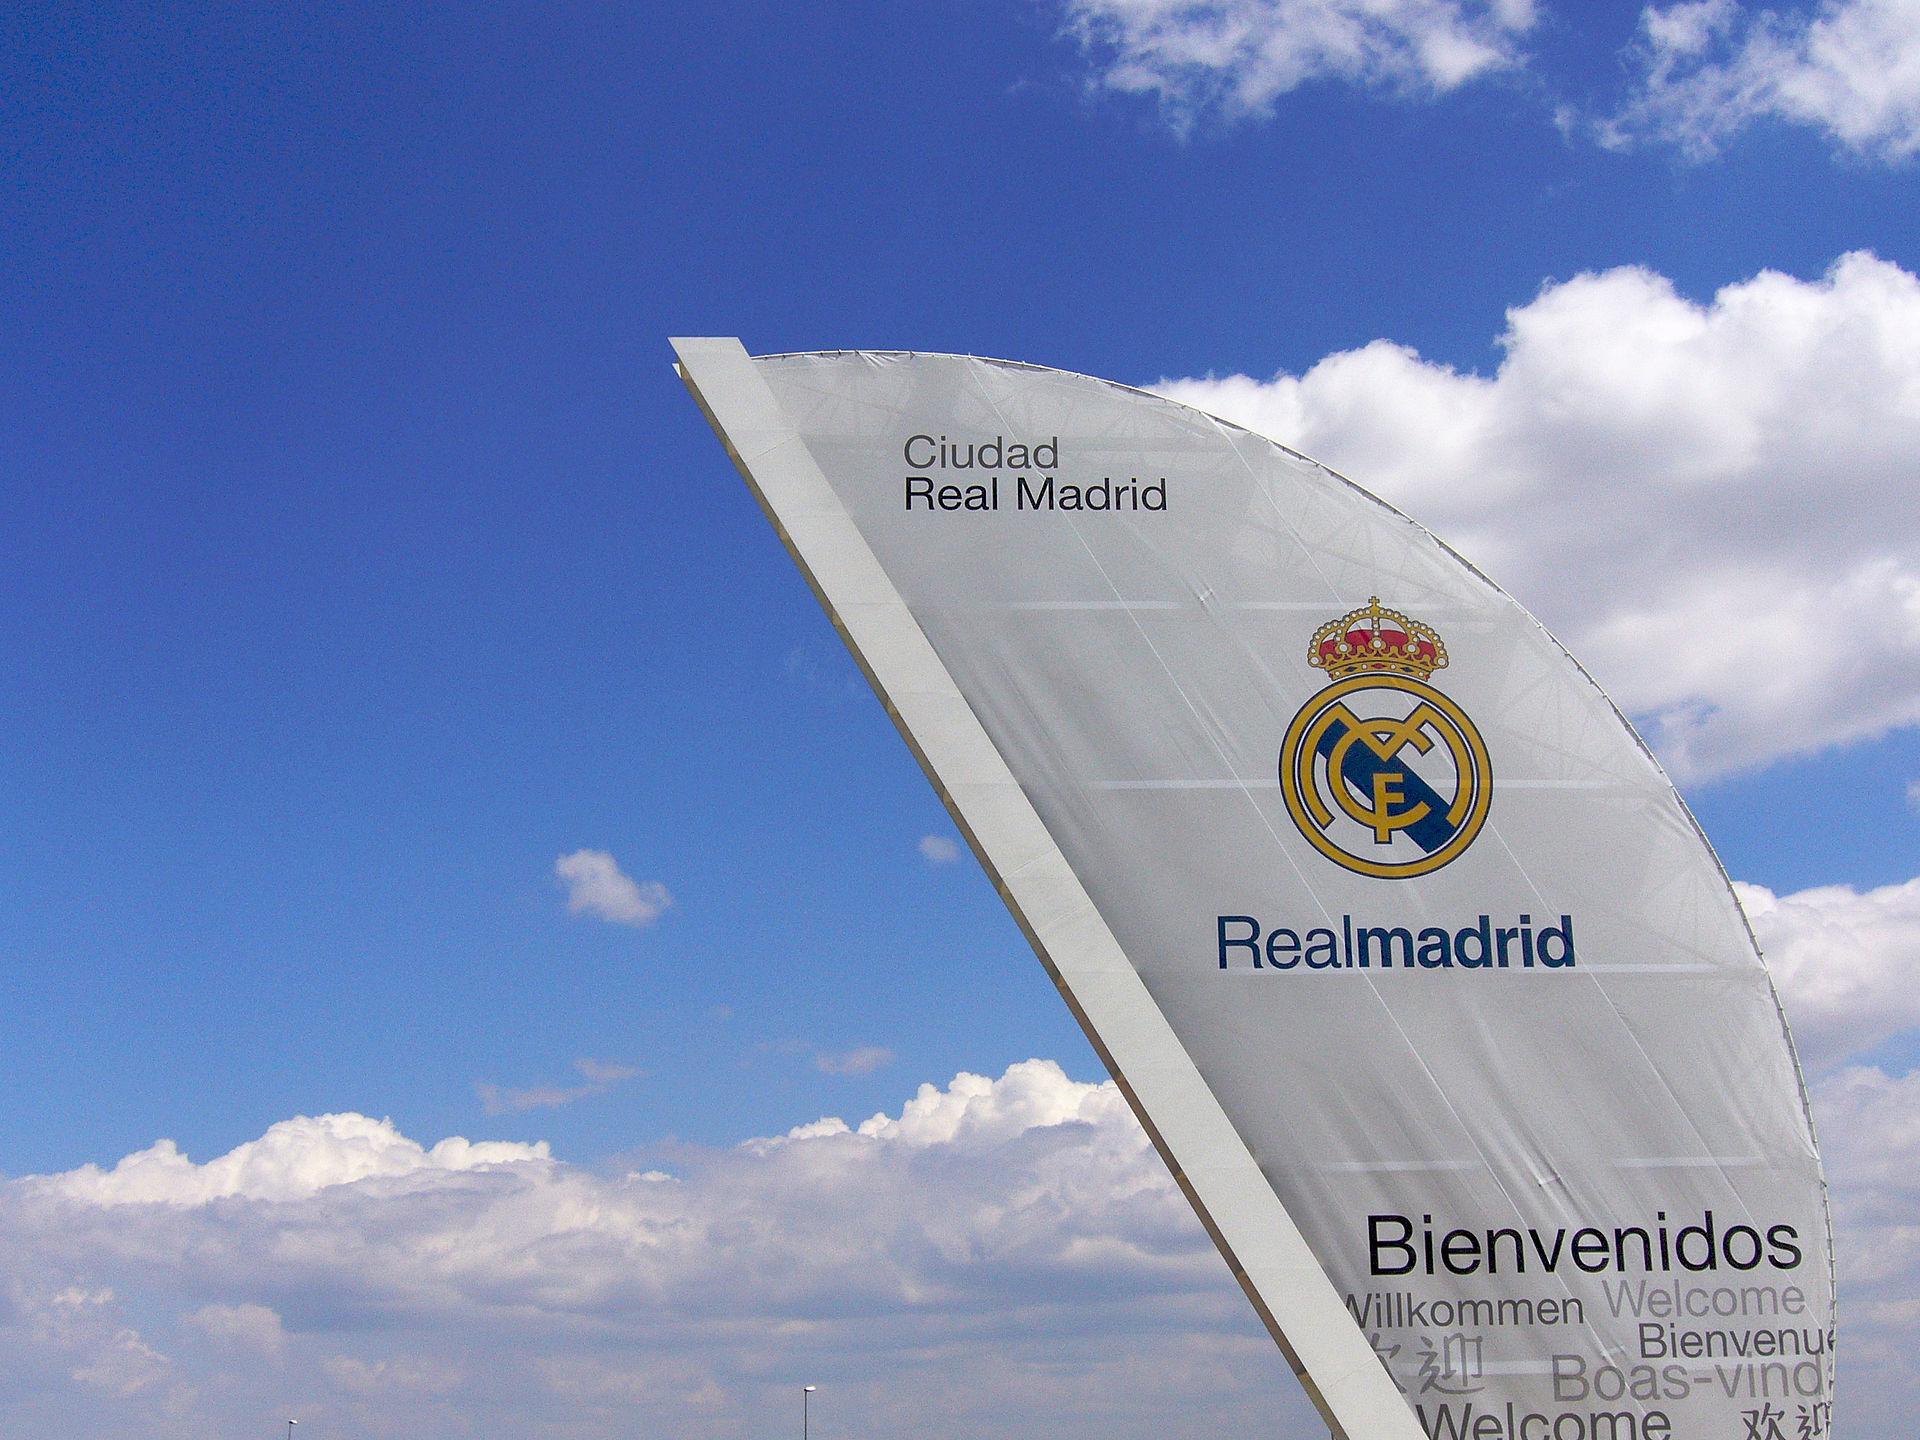 Ciudad Real Madrid - Wikipedia